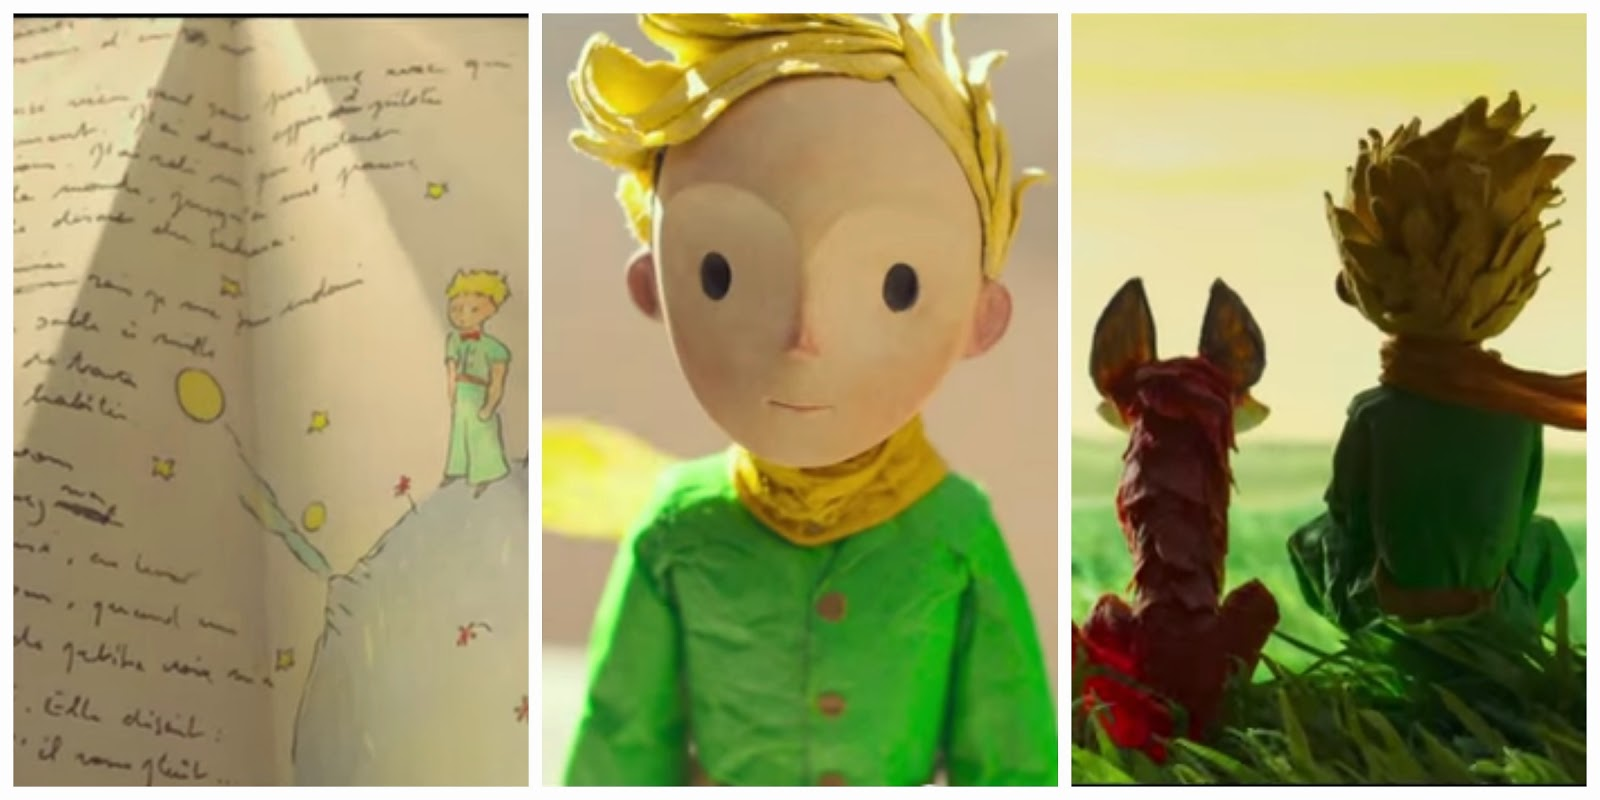 Filme O Pequeno Principe 2015 within o pequeno príncipe e eu : vote no pequeno príncipe!